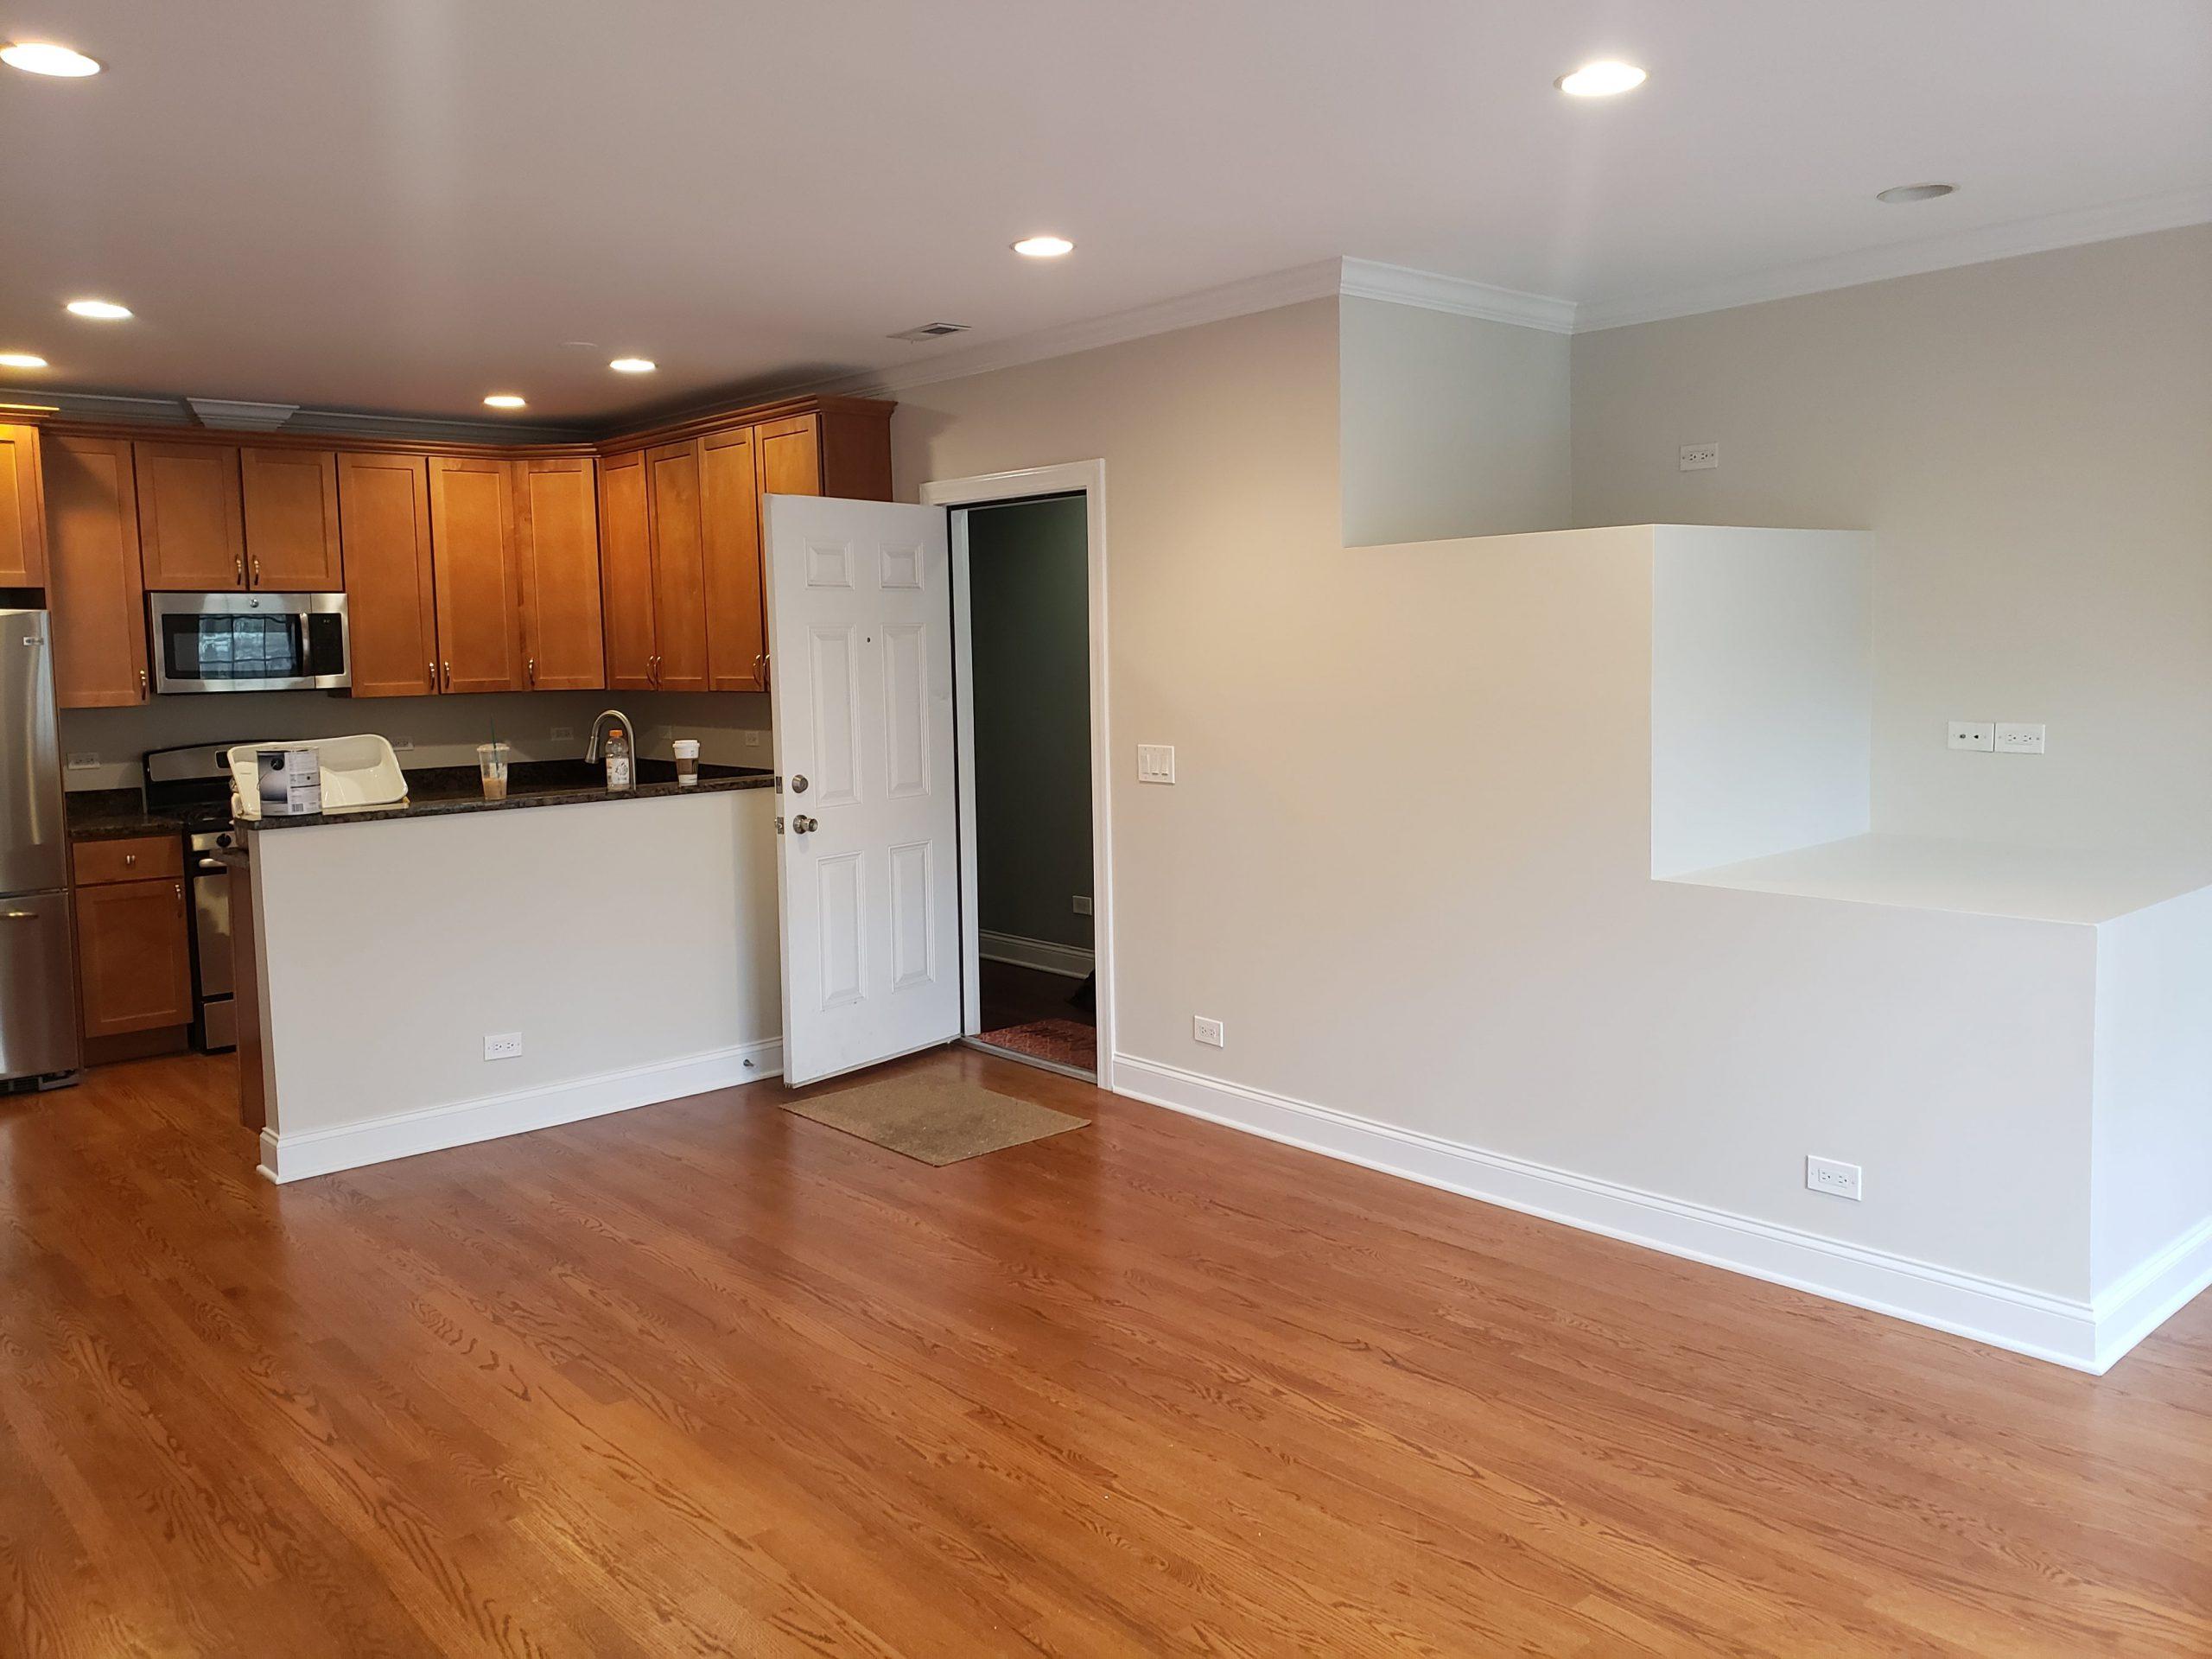 painters-northbrook-interior-painters-northbrook